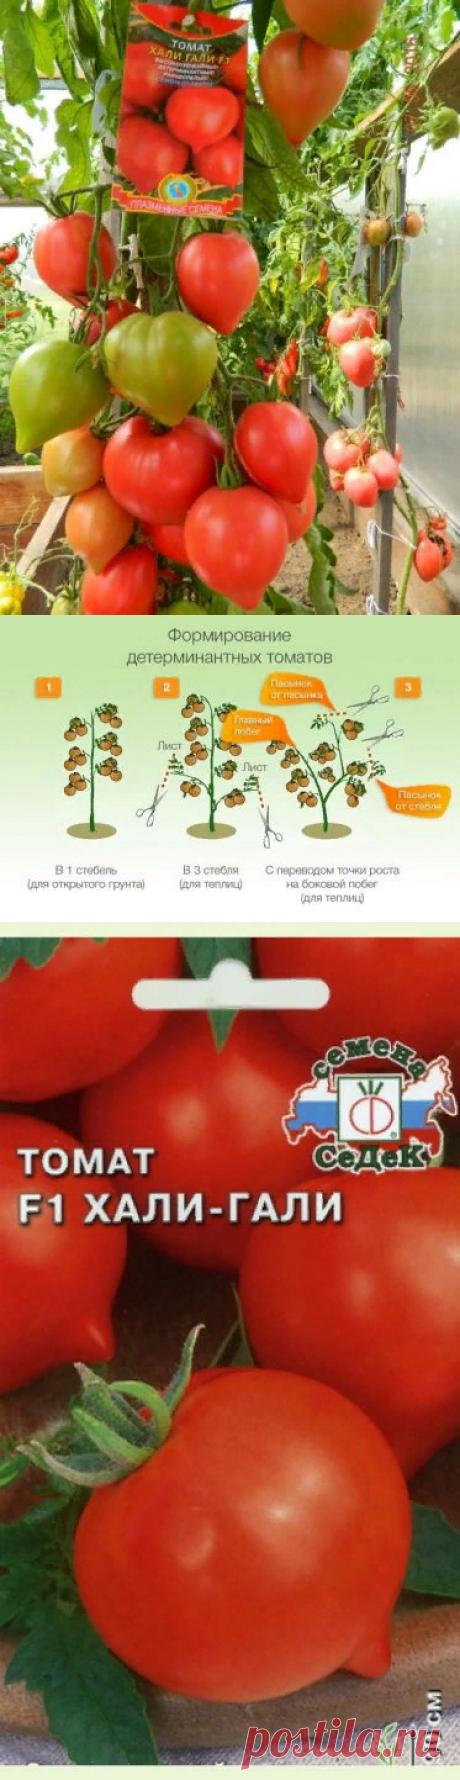 Томат Хали-Гали F1: описание и характеристика сорта, особенности выращивания, отзывы тех, кто сажал, фото